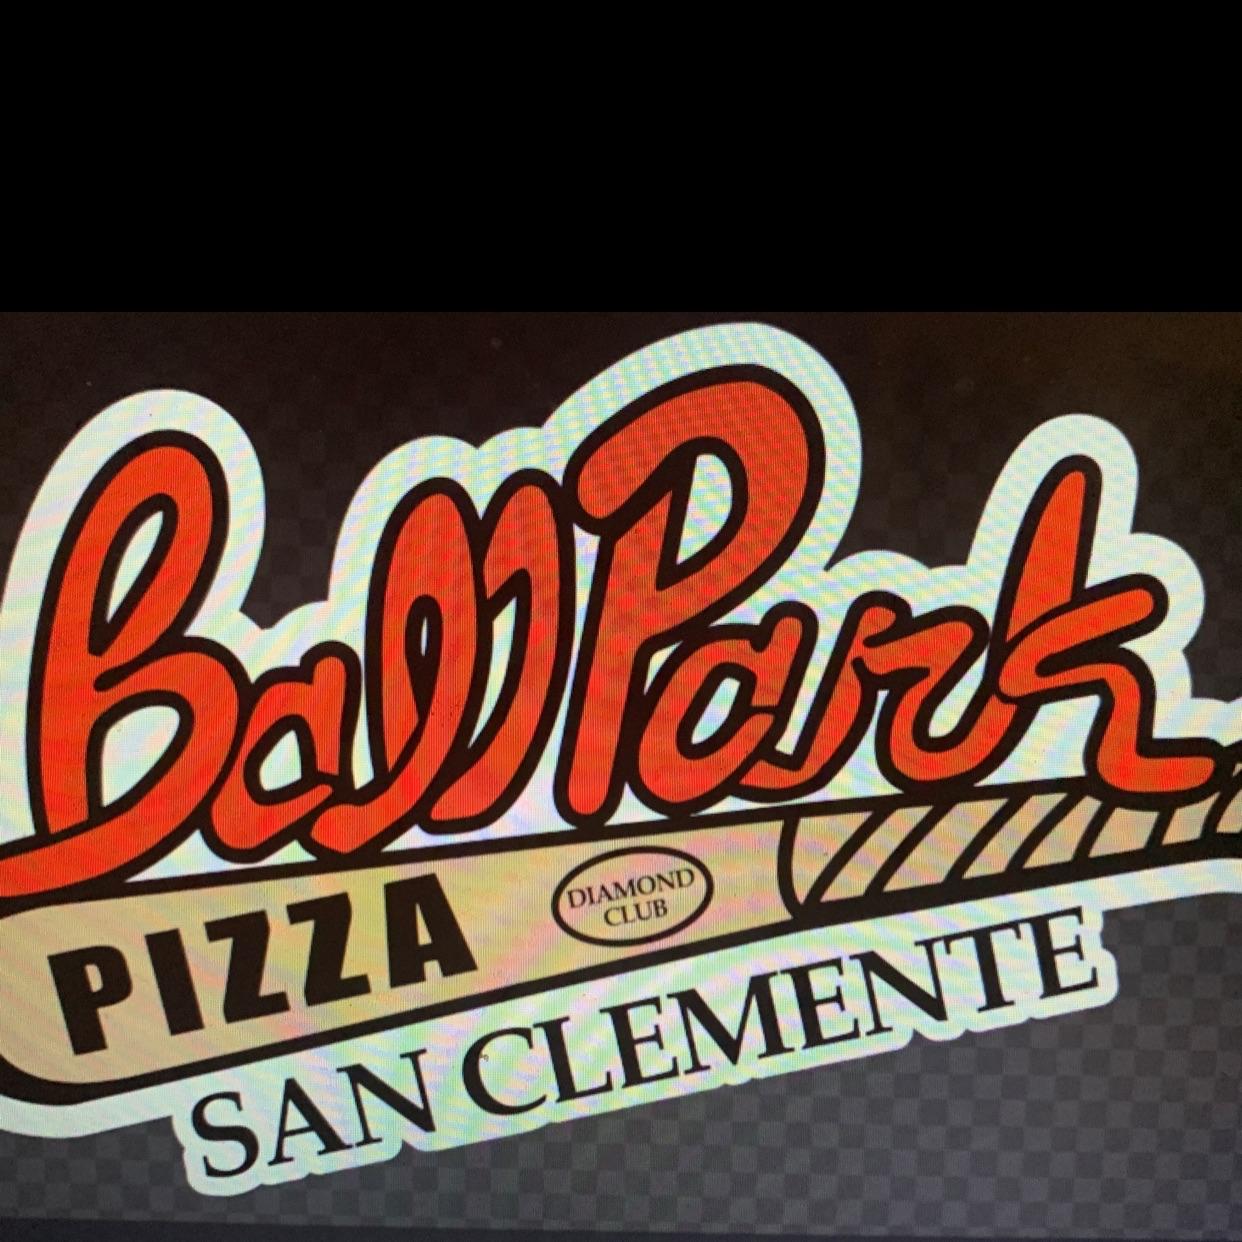 Ballpark Pizza